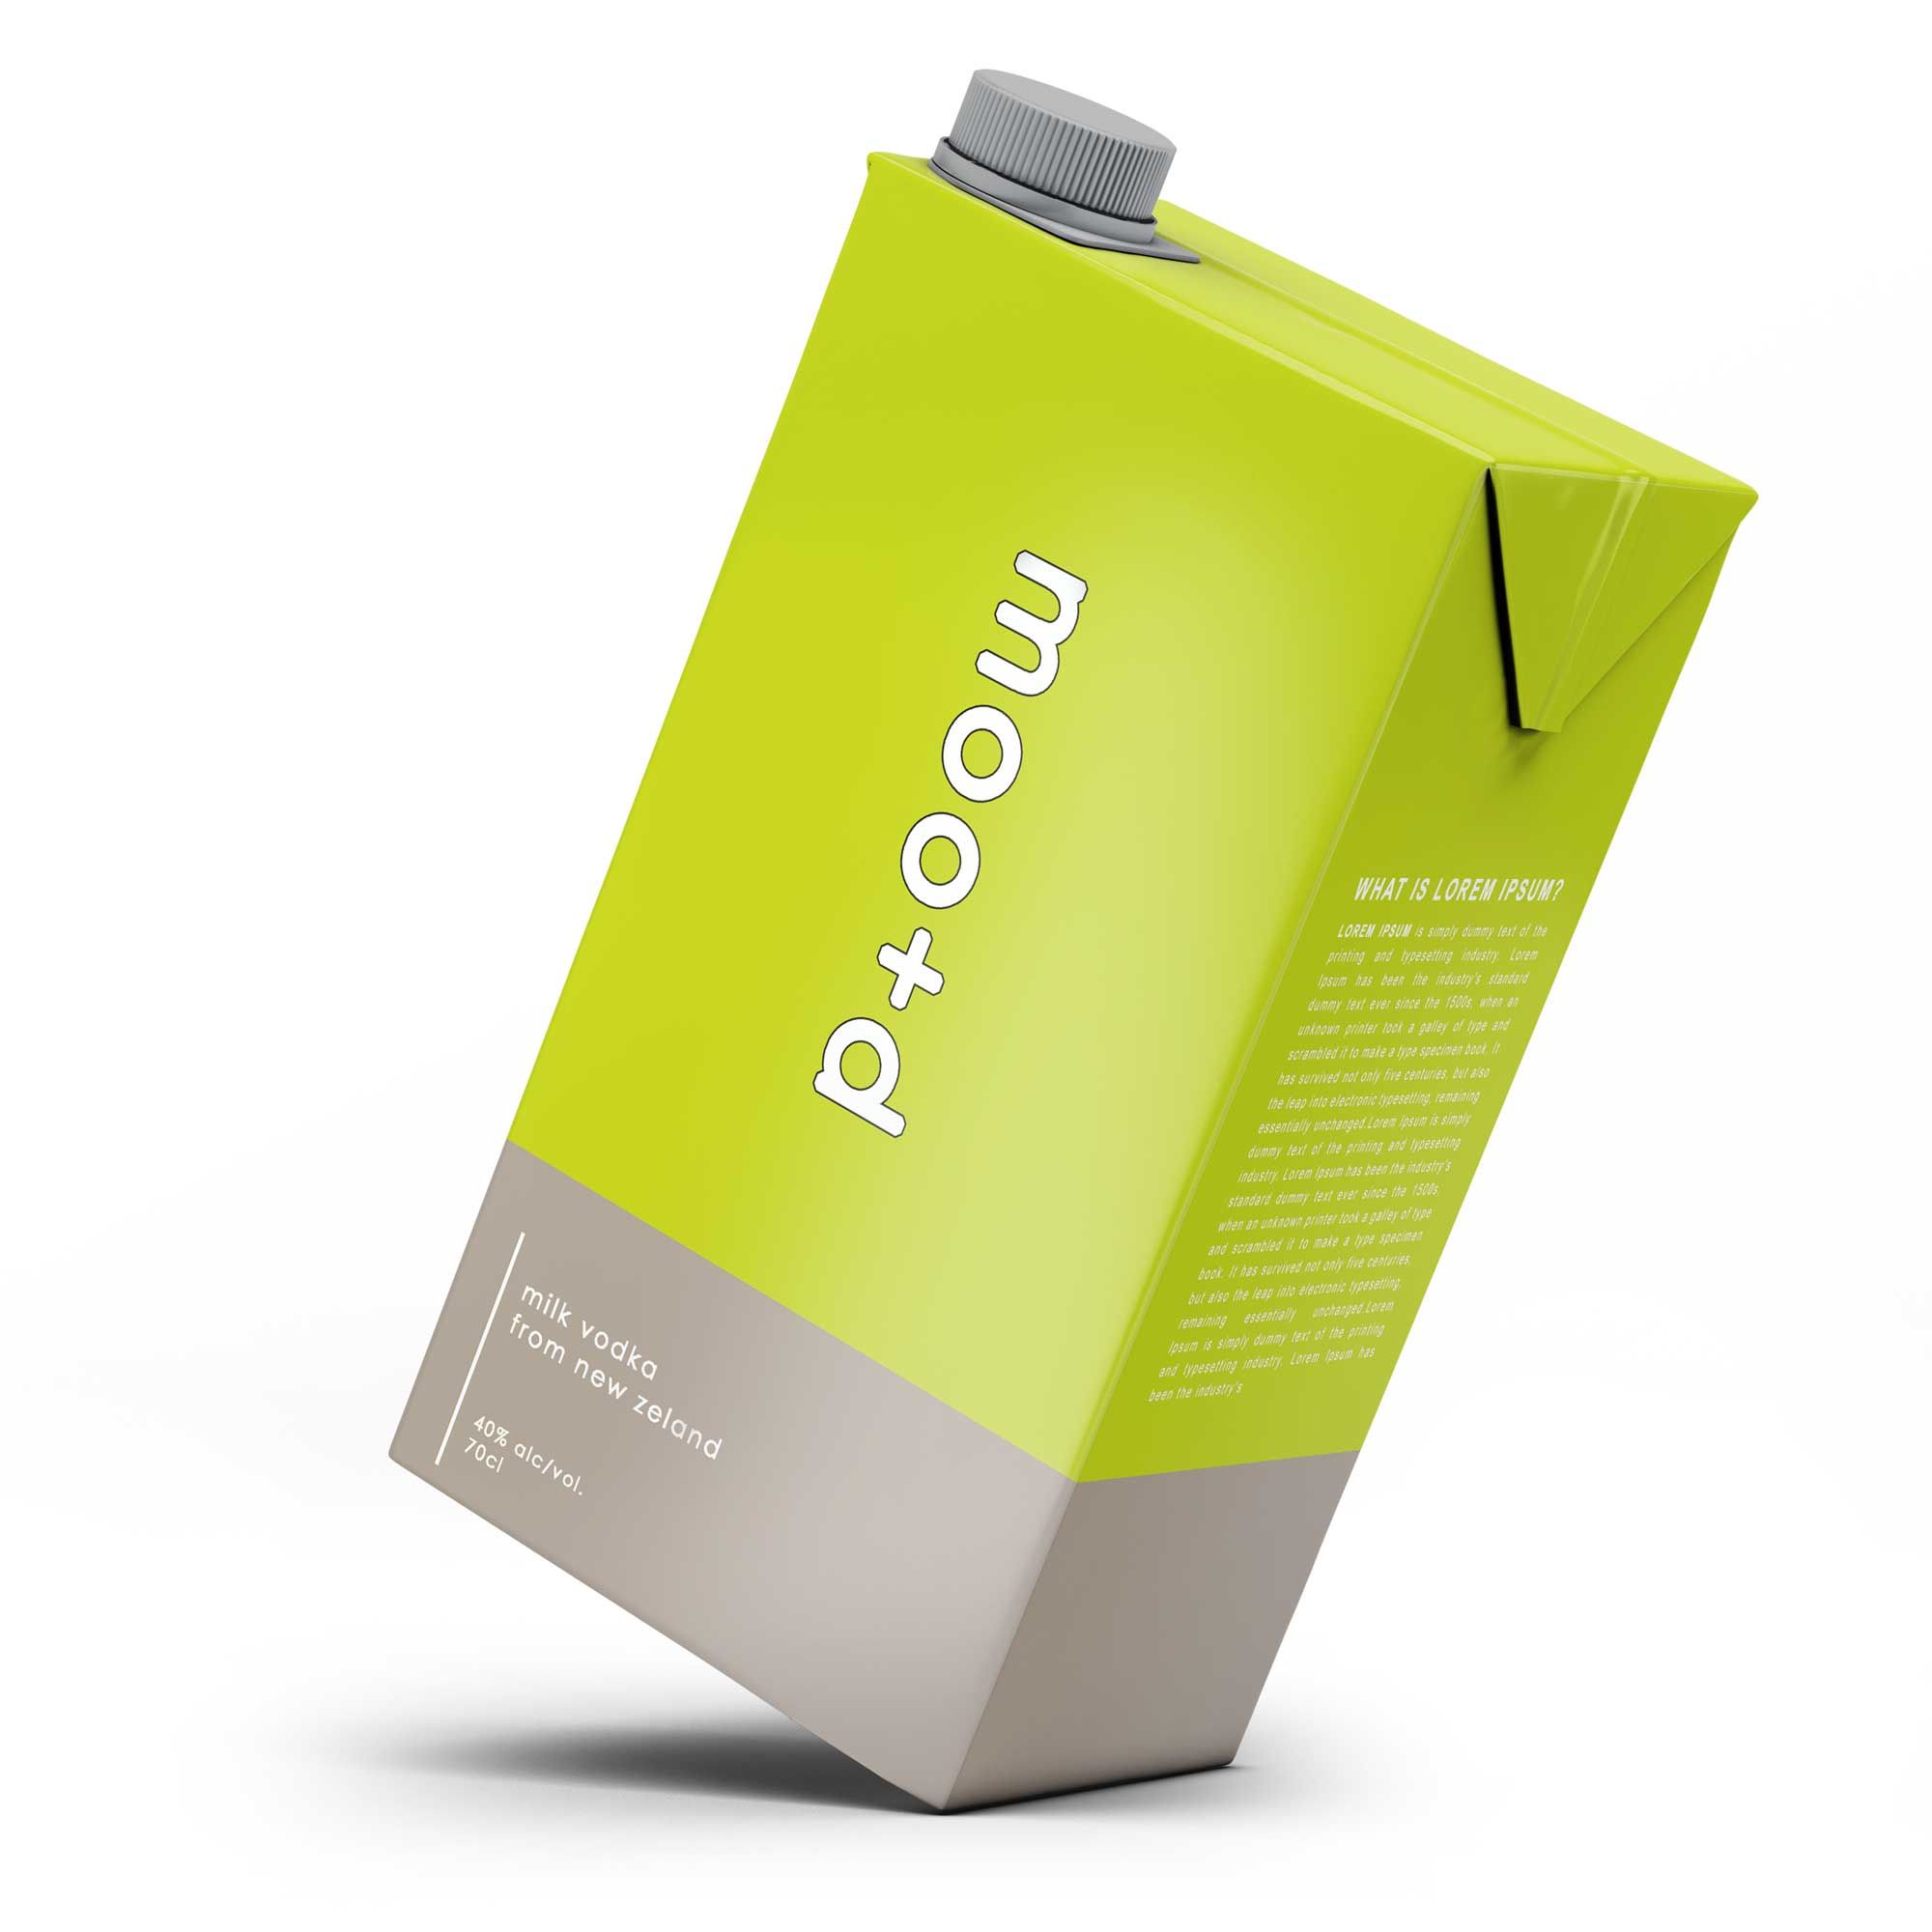 Download Free Green Real Juice Carton Packet Mockup Cartonmockup Freedownload Freepsd Mockups Packetmockup Psd Psddownload Packagingm Juice Carton Carton Packet